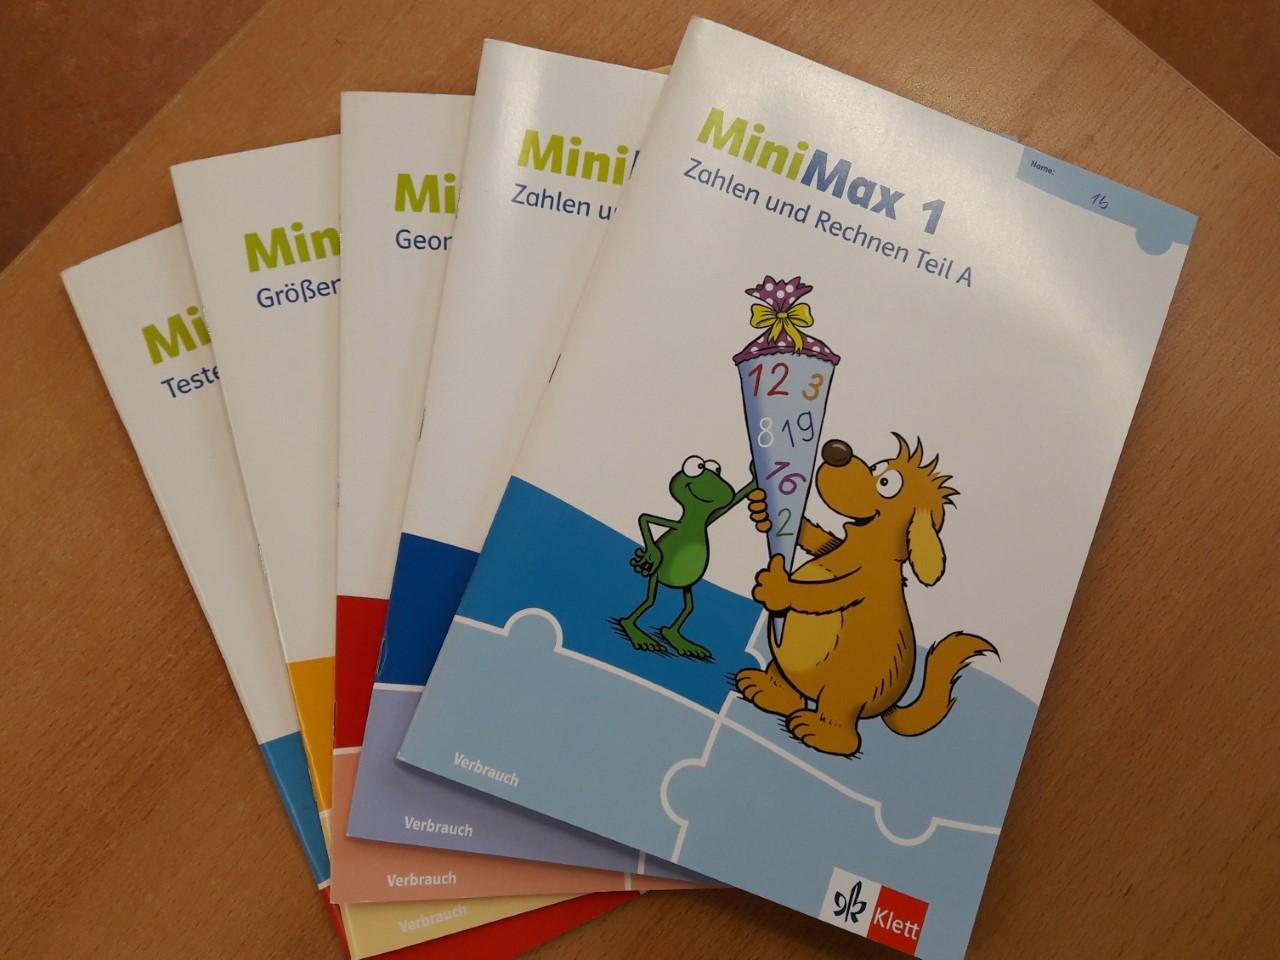 Minimax-Hefte